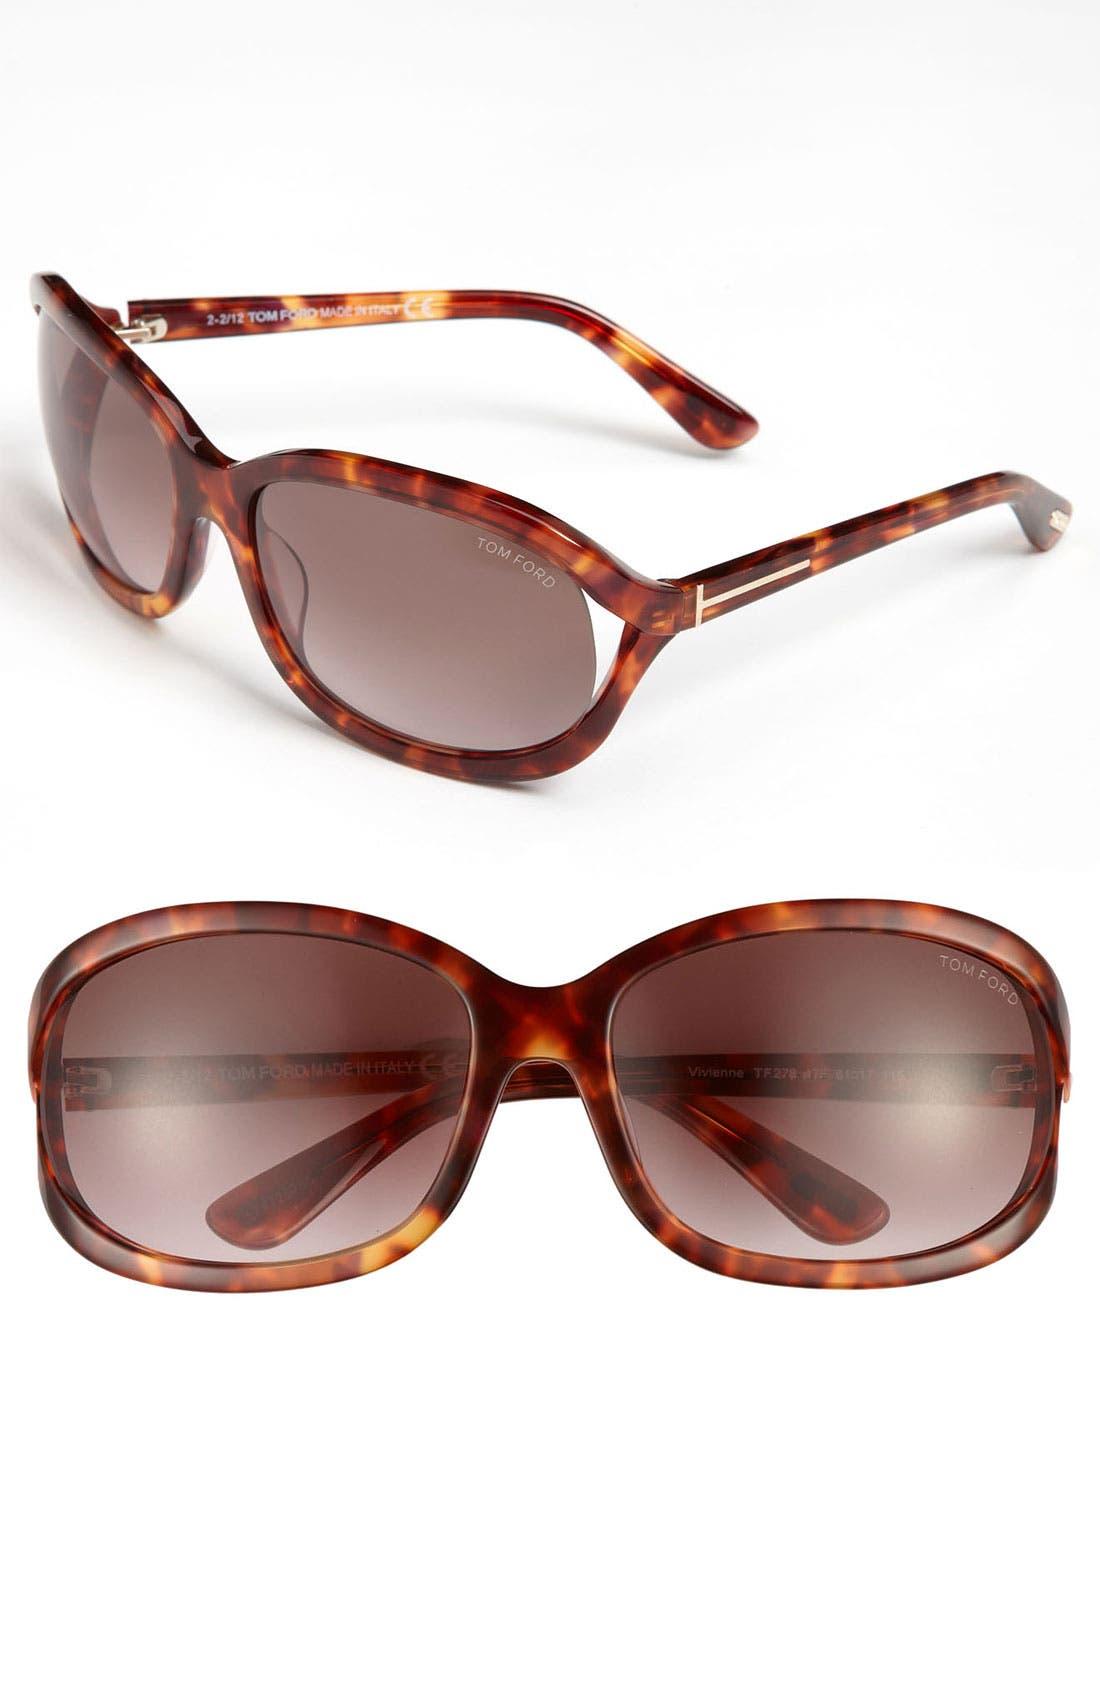 Main Image - Tom Ford 'Vivienne' 61mm Sunglasses